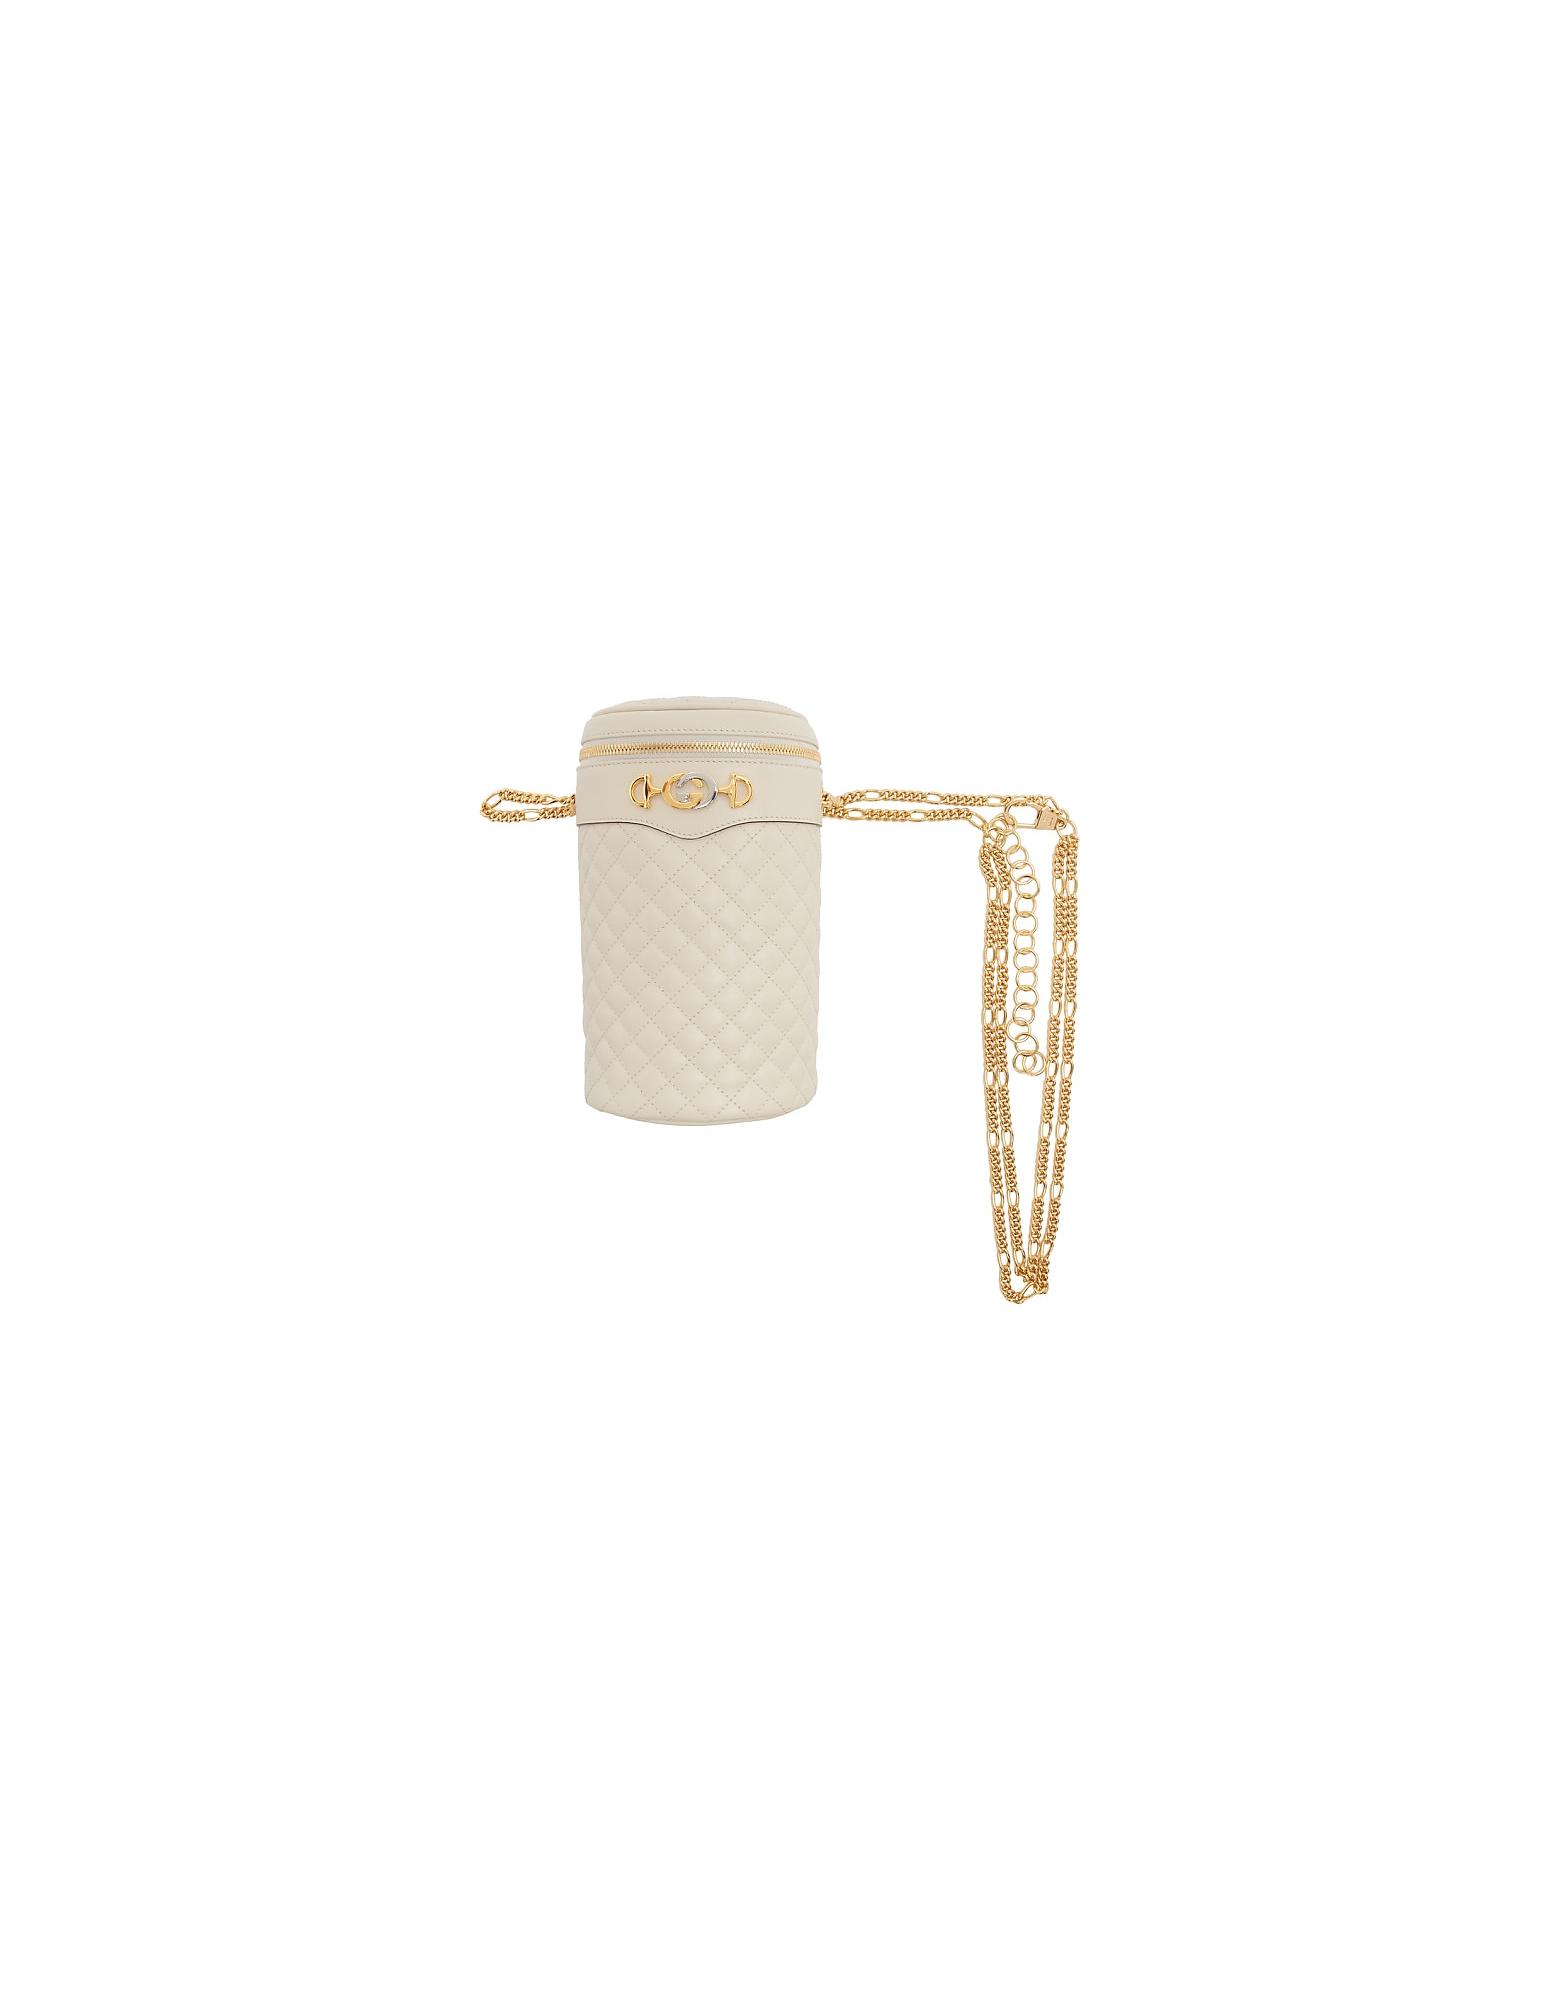 Gucci Designer Handbags, Off-White Quilted Leather Belt Bag